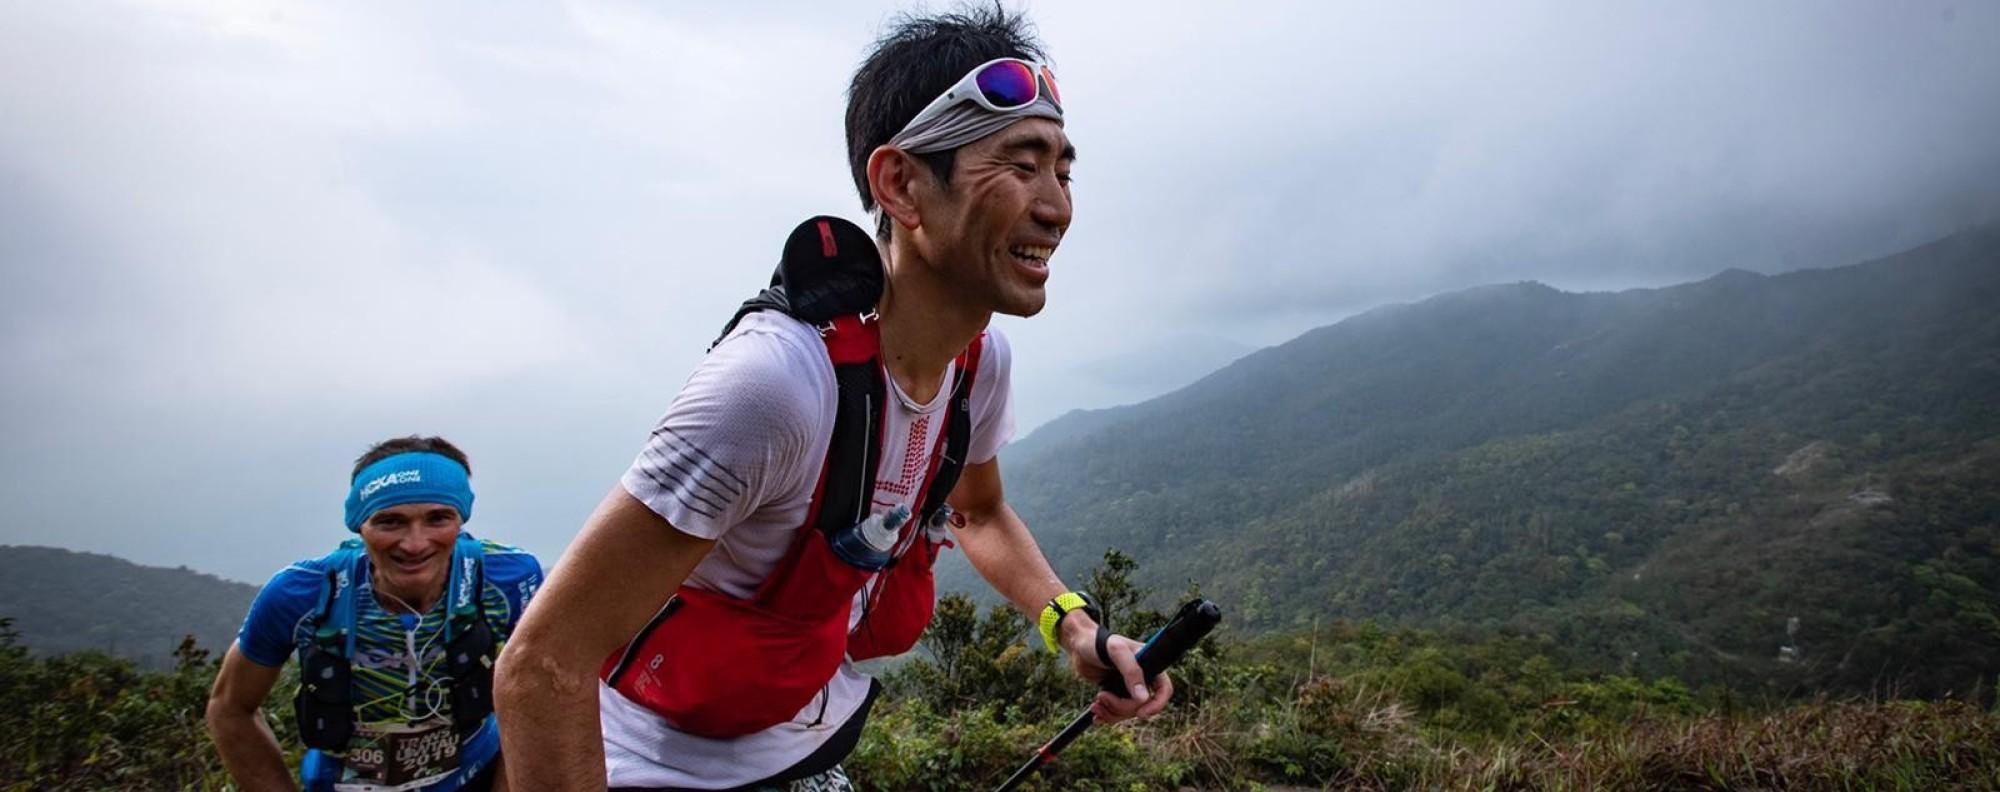 Kazufumi Ose leads Antoine Guillon during Saturday's Translantau 100. Photo: Sunny Lee